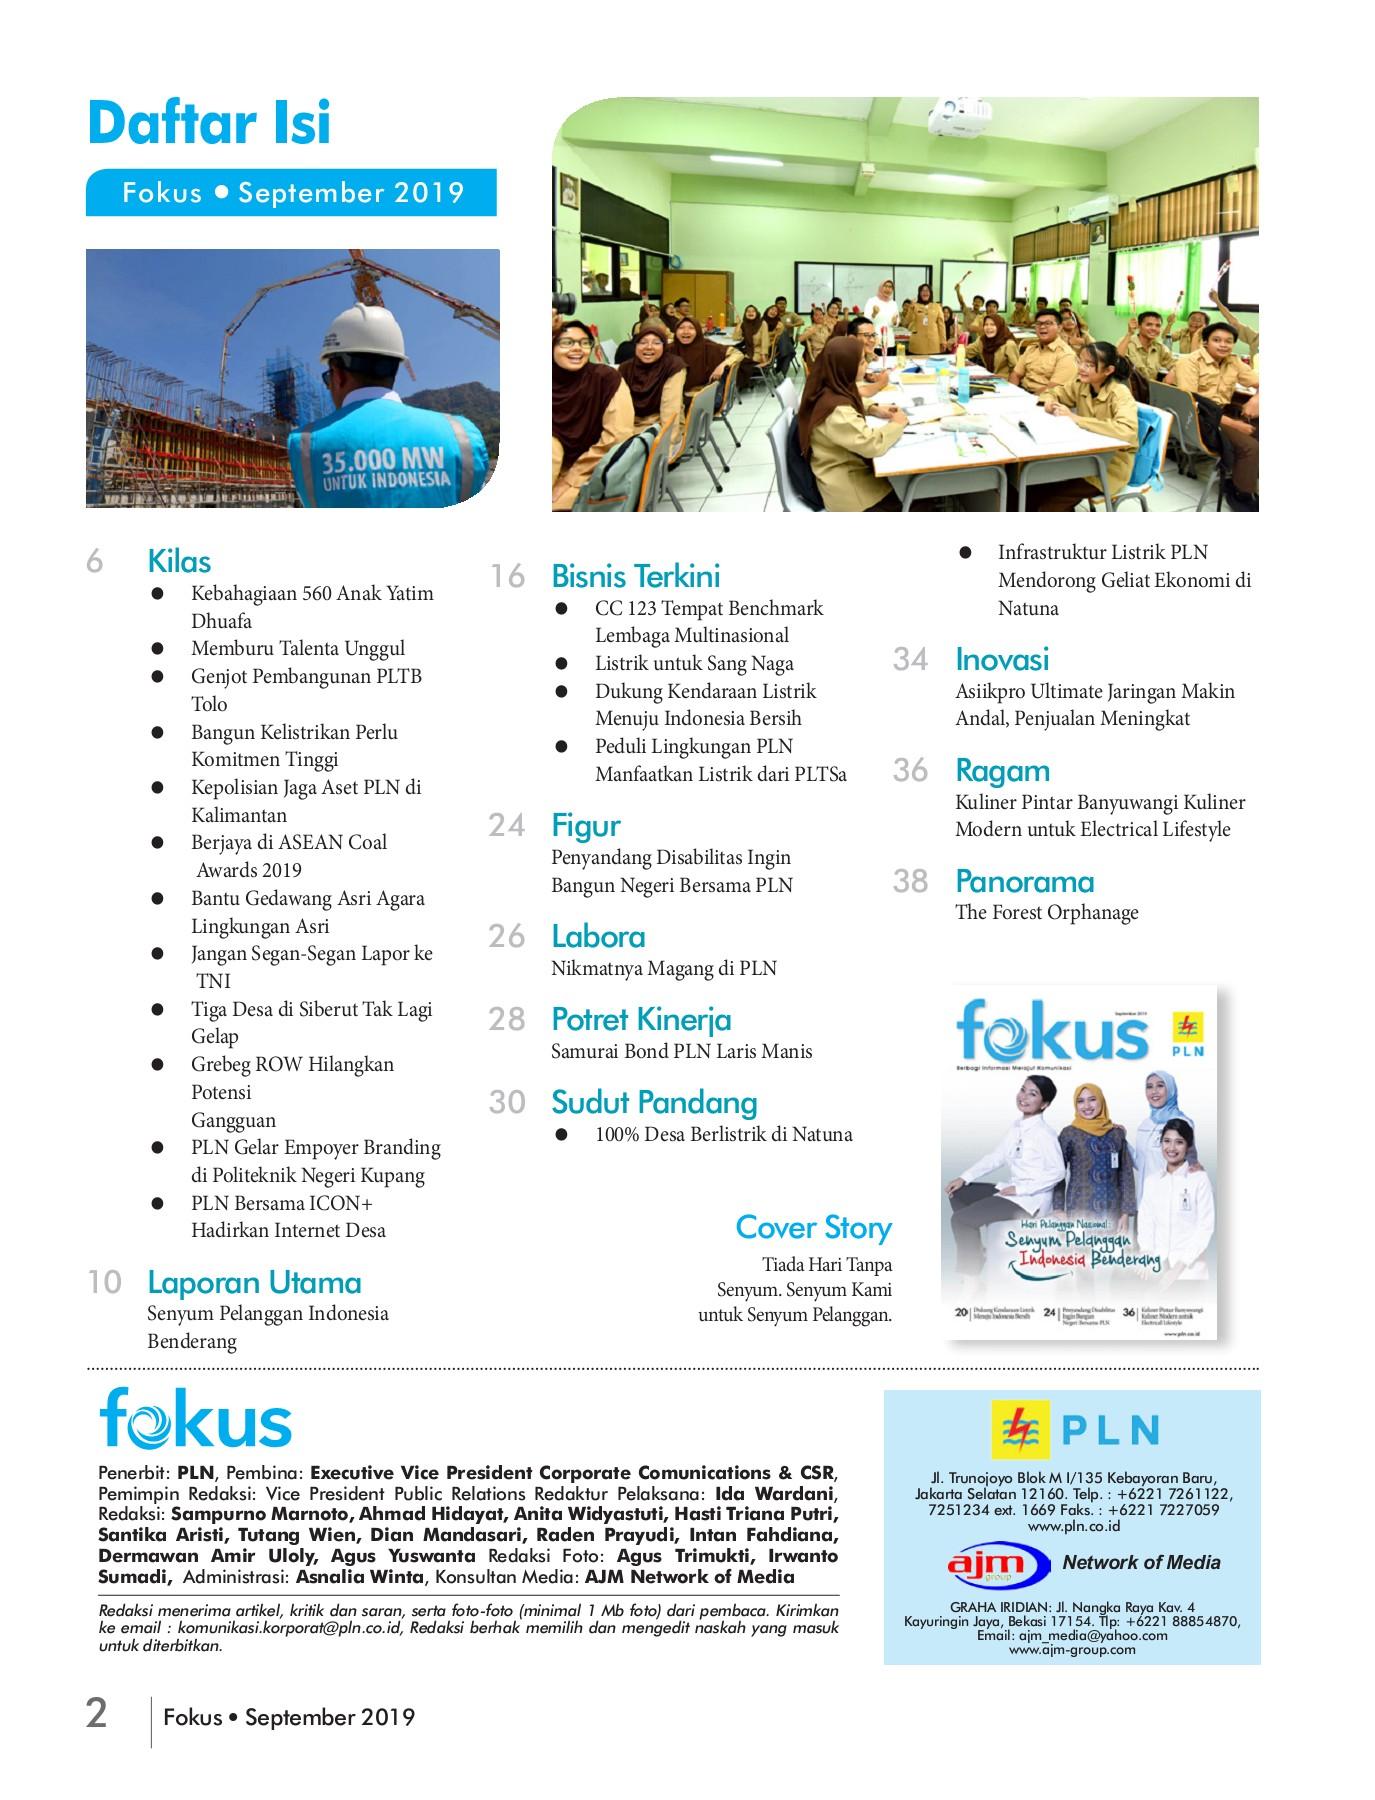 Layout Fokus September Flip Book Pages 1 40 Pubhtml5